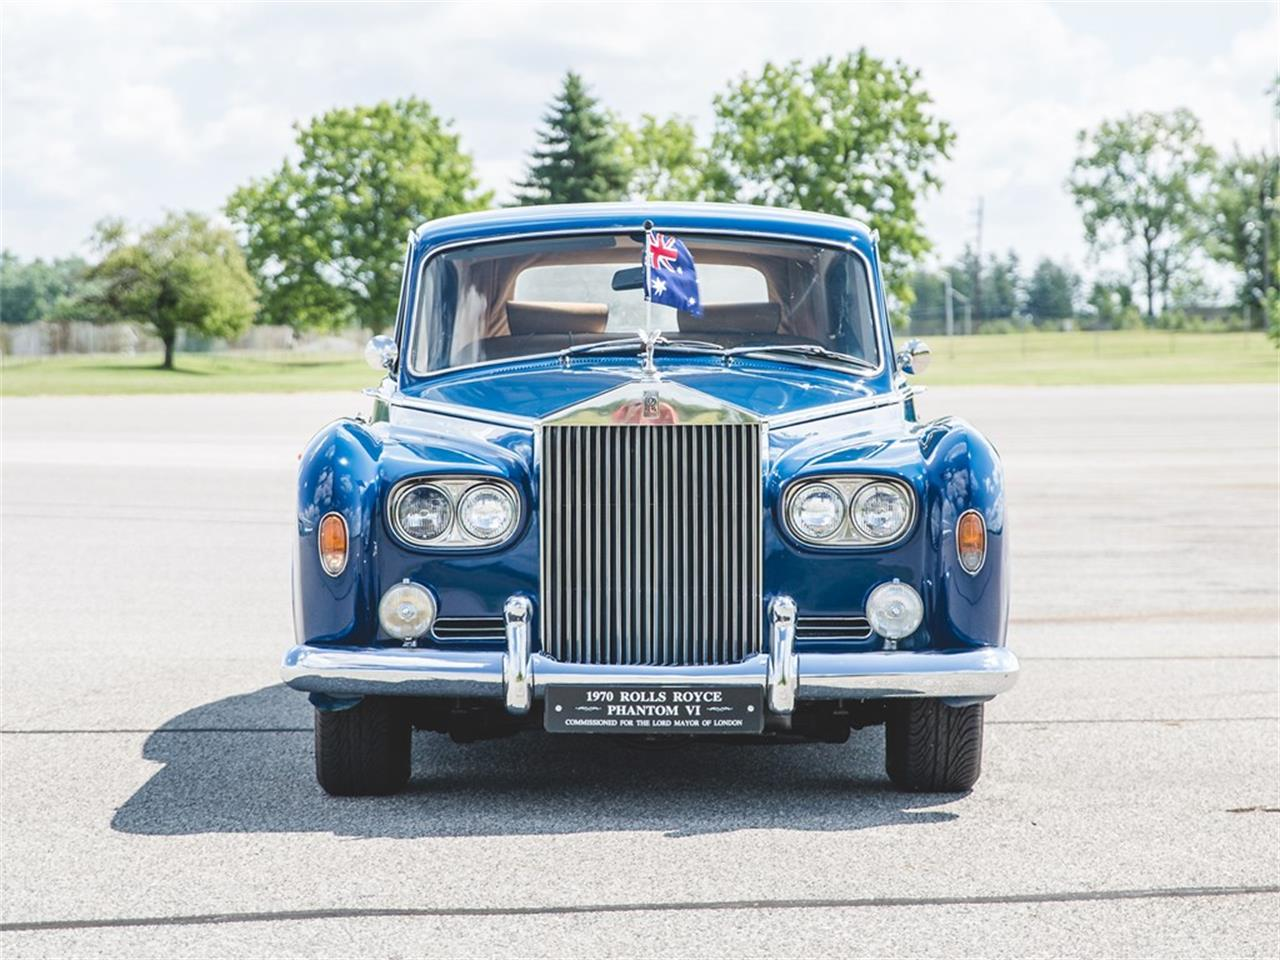 1970 Rolls-Royce Phantom VI for sale in Auburn, IN ...